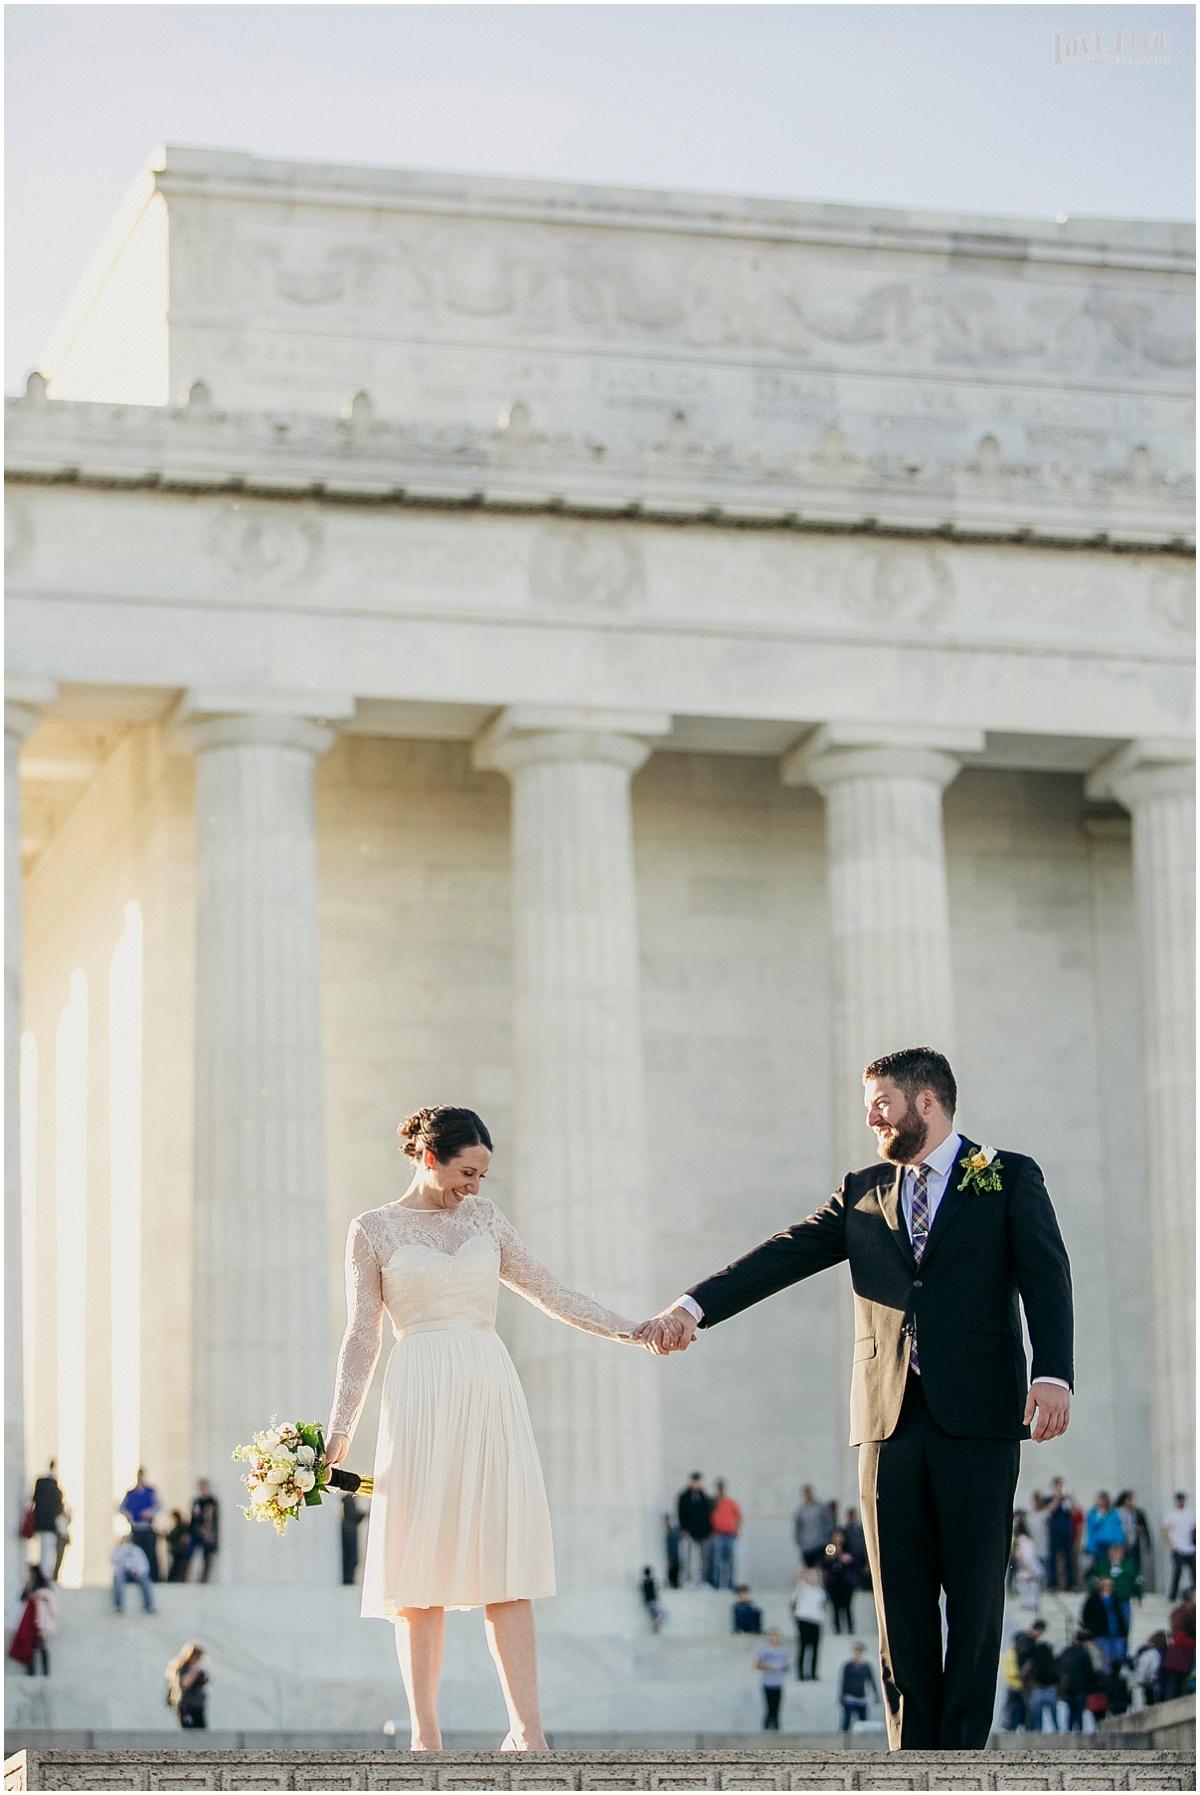 prioritizing-Wedding-photography-advice_0024.jpg